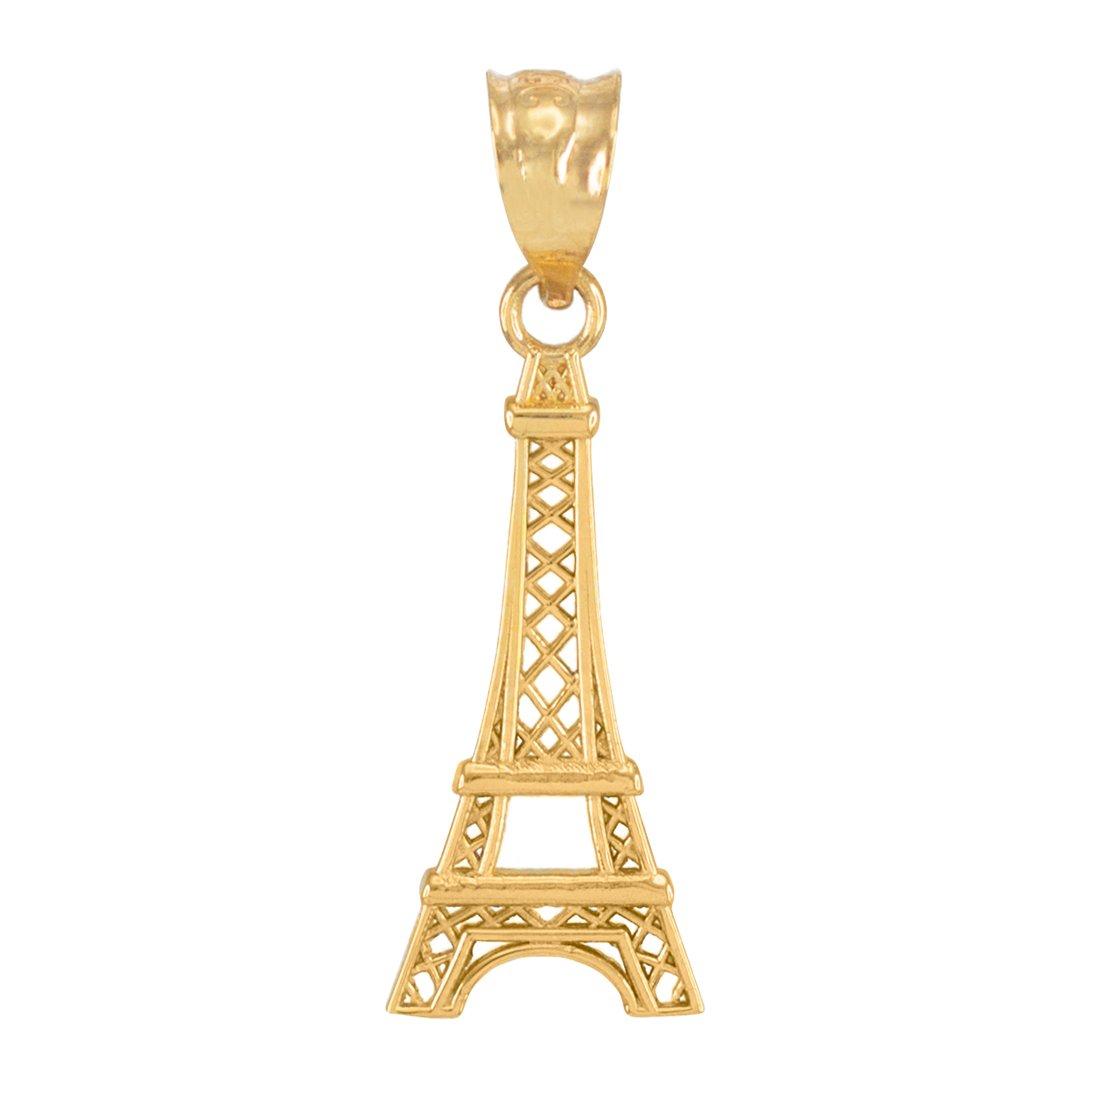 LA BLINGZ 10K Yellow Gold Paris Eiffel Tower Travel Charm Pendant